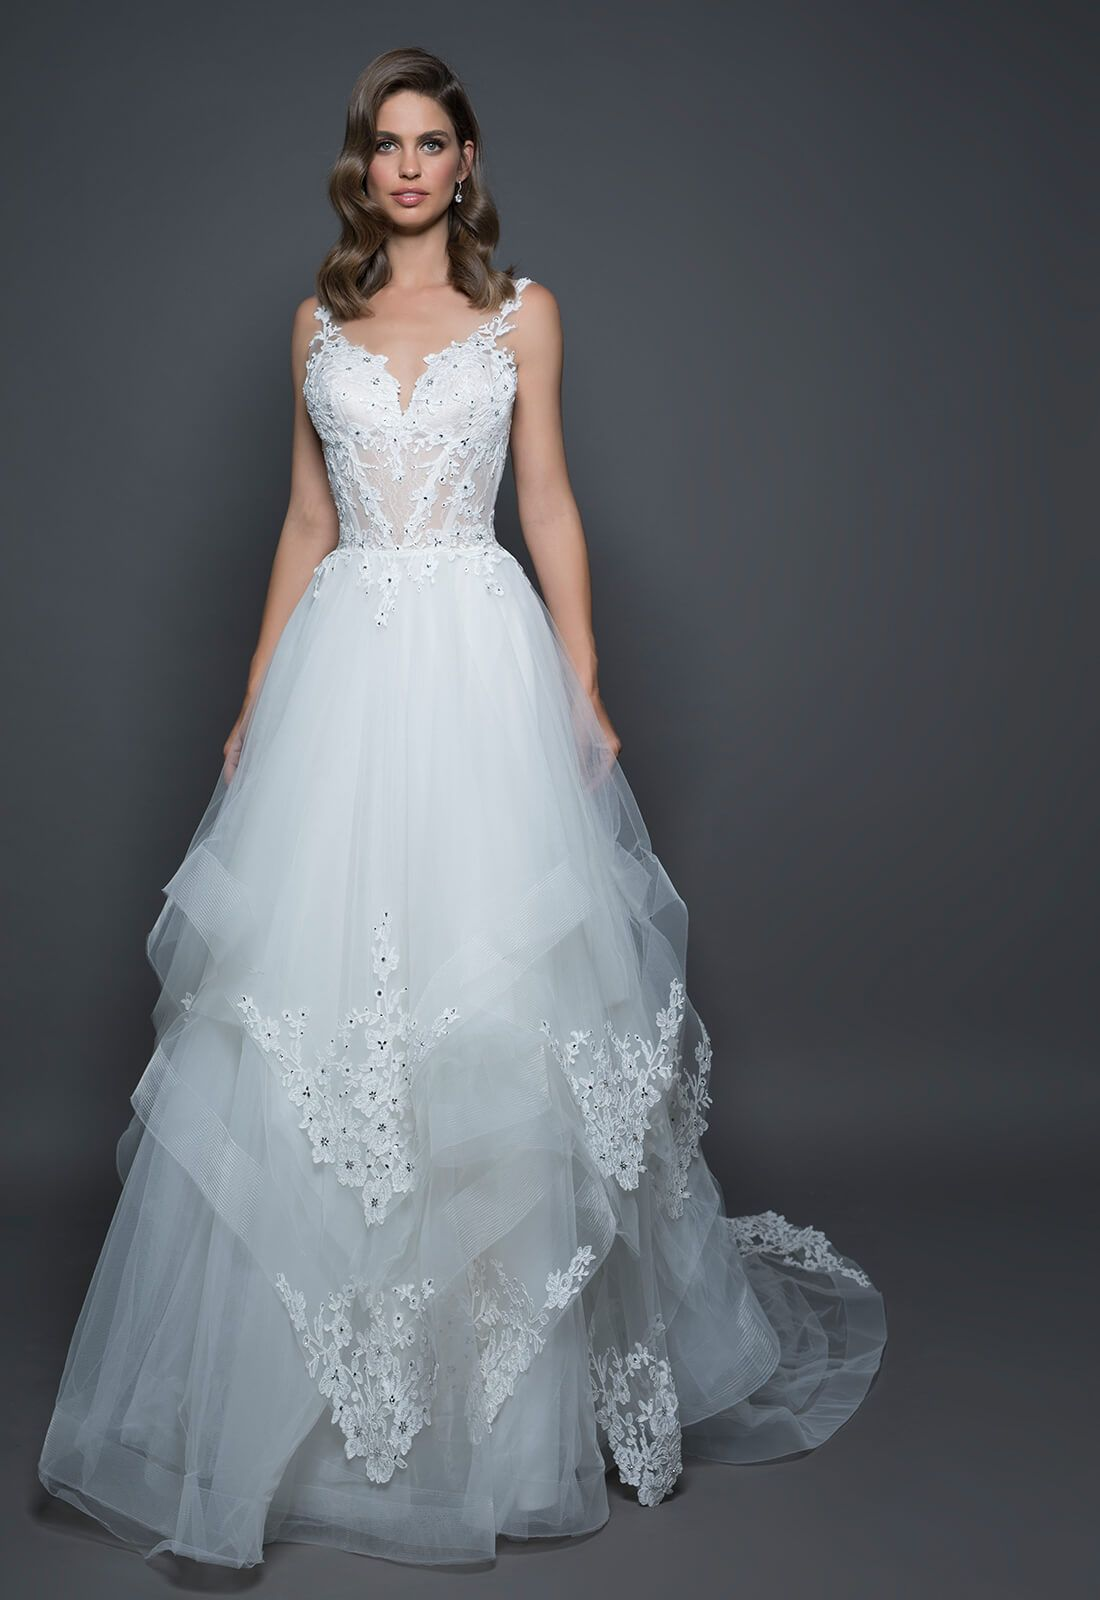 STYLE NO. 14590 | wedding ✨ | Pinterest | Pnina tornai, Wedding and ...